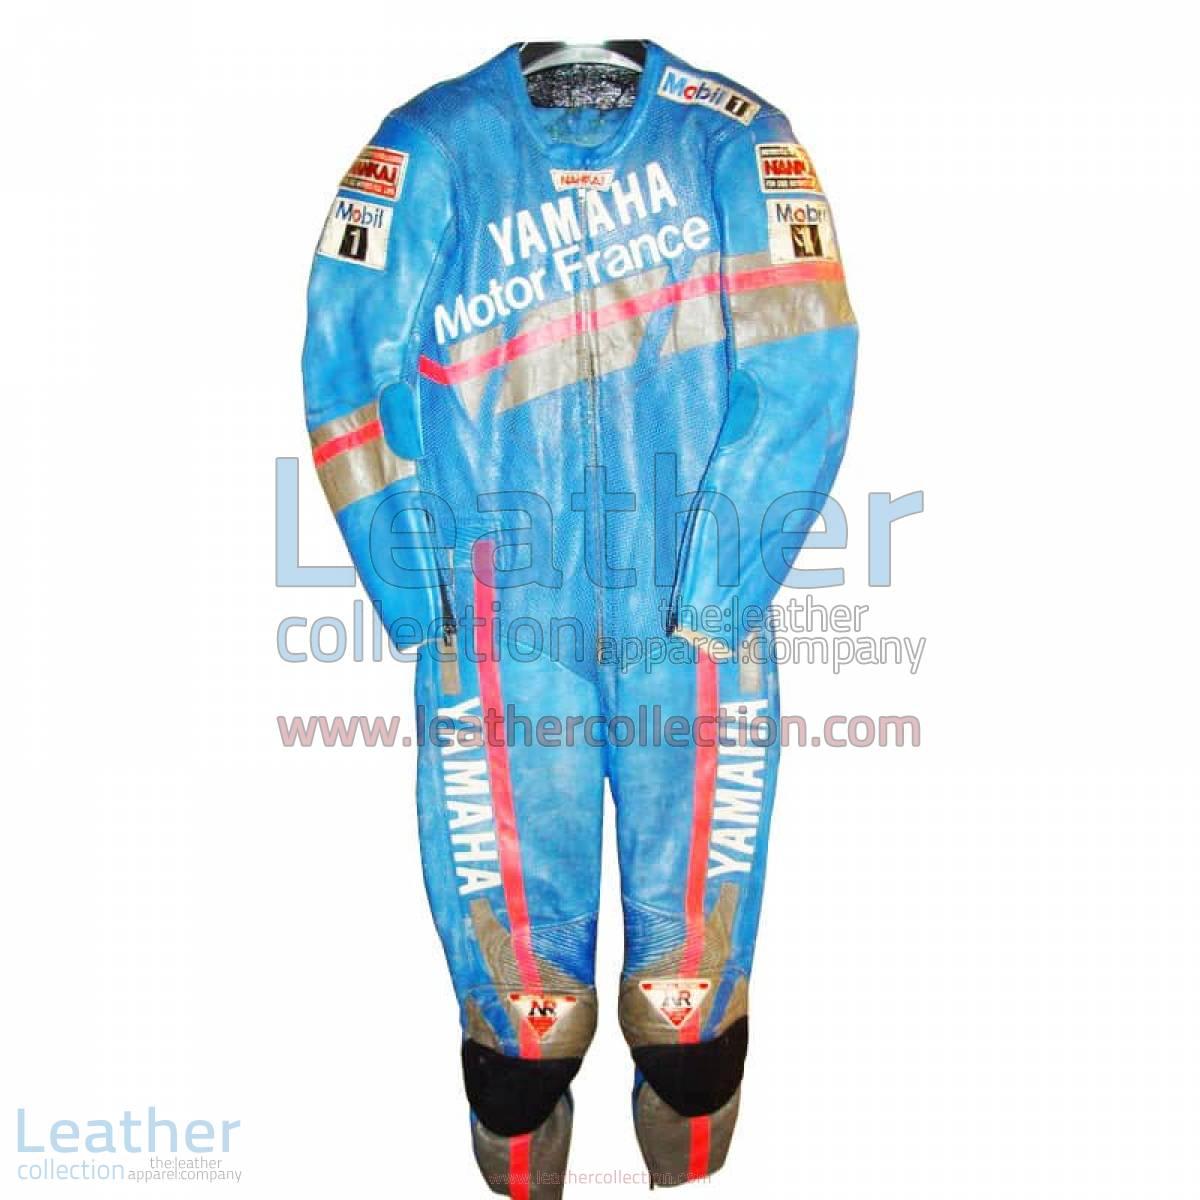 Niall Mackenzie Yamaha GP 1991 Leathers | yamaha leathers